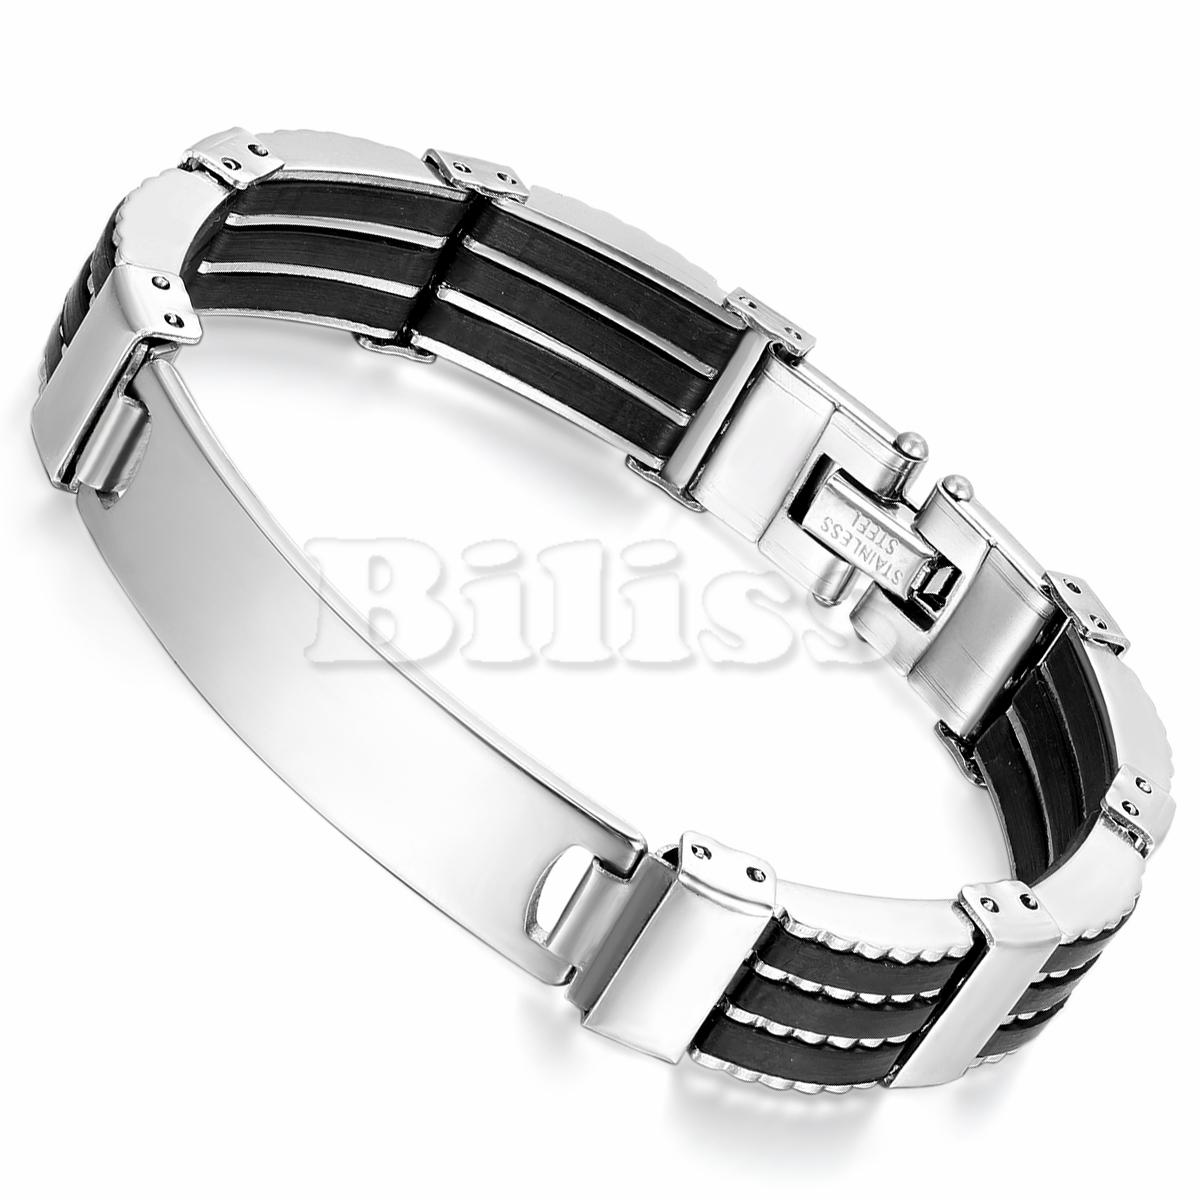 "8.5"" Trendy Male ID Bracelet Men's Bracelet Cuff Wristband Bangle Silver Stainless Steel Black Silicone pulseira masculina(China (Mainland))"